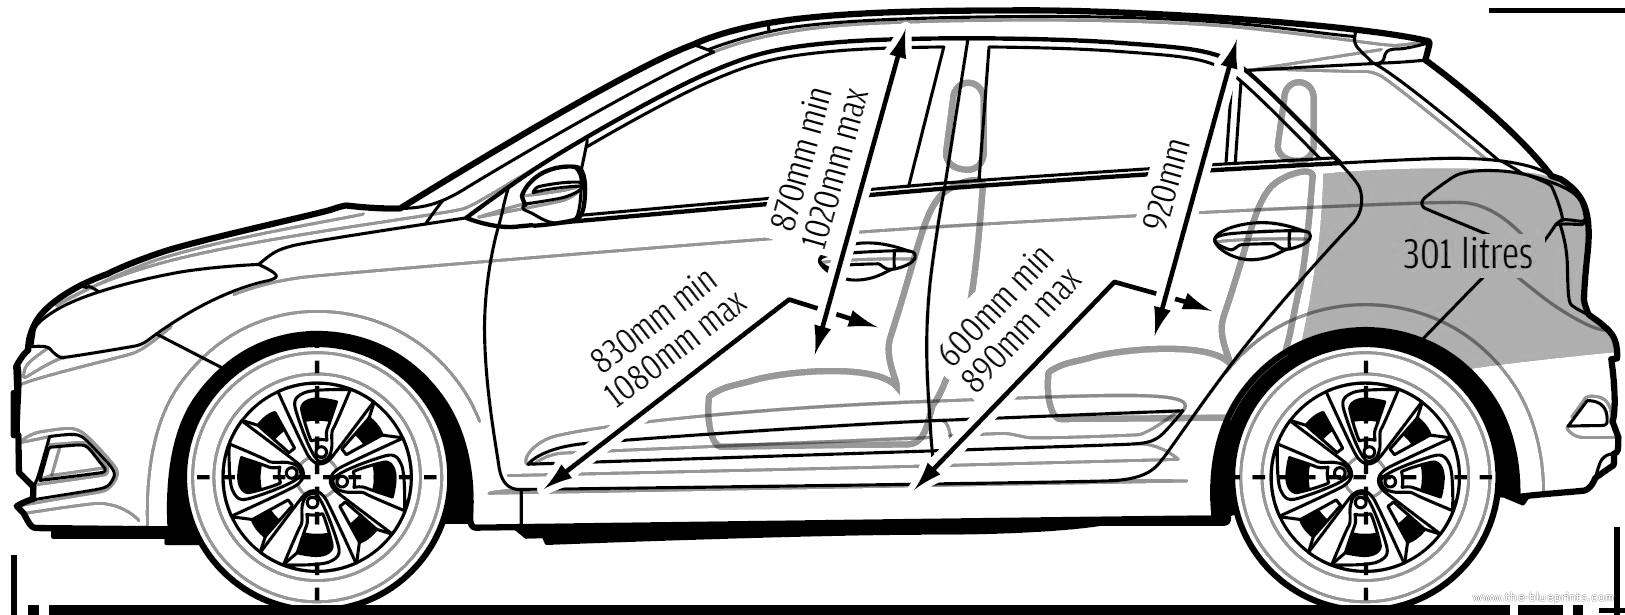 blueprints  u0026gt  cars  u0026gt  hyundai  u0026gt  hyundai i20  2014